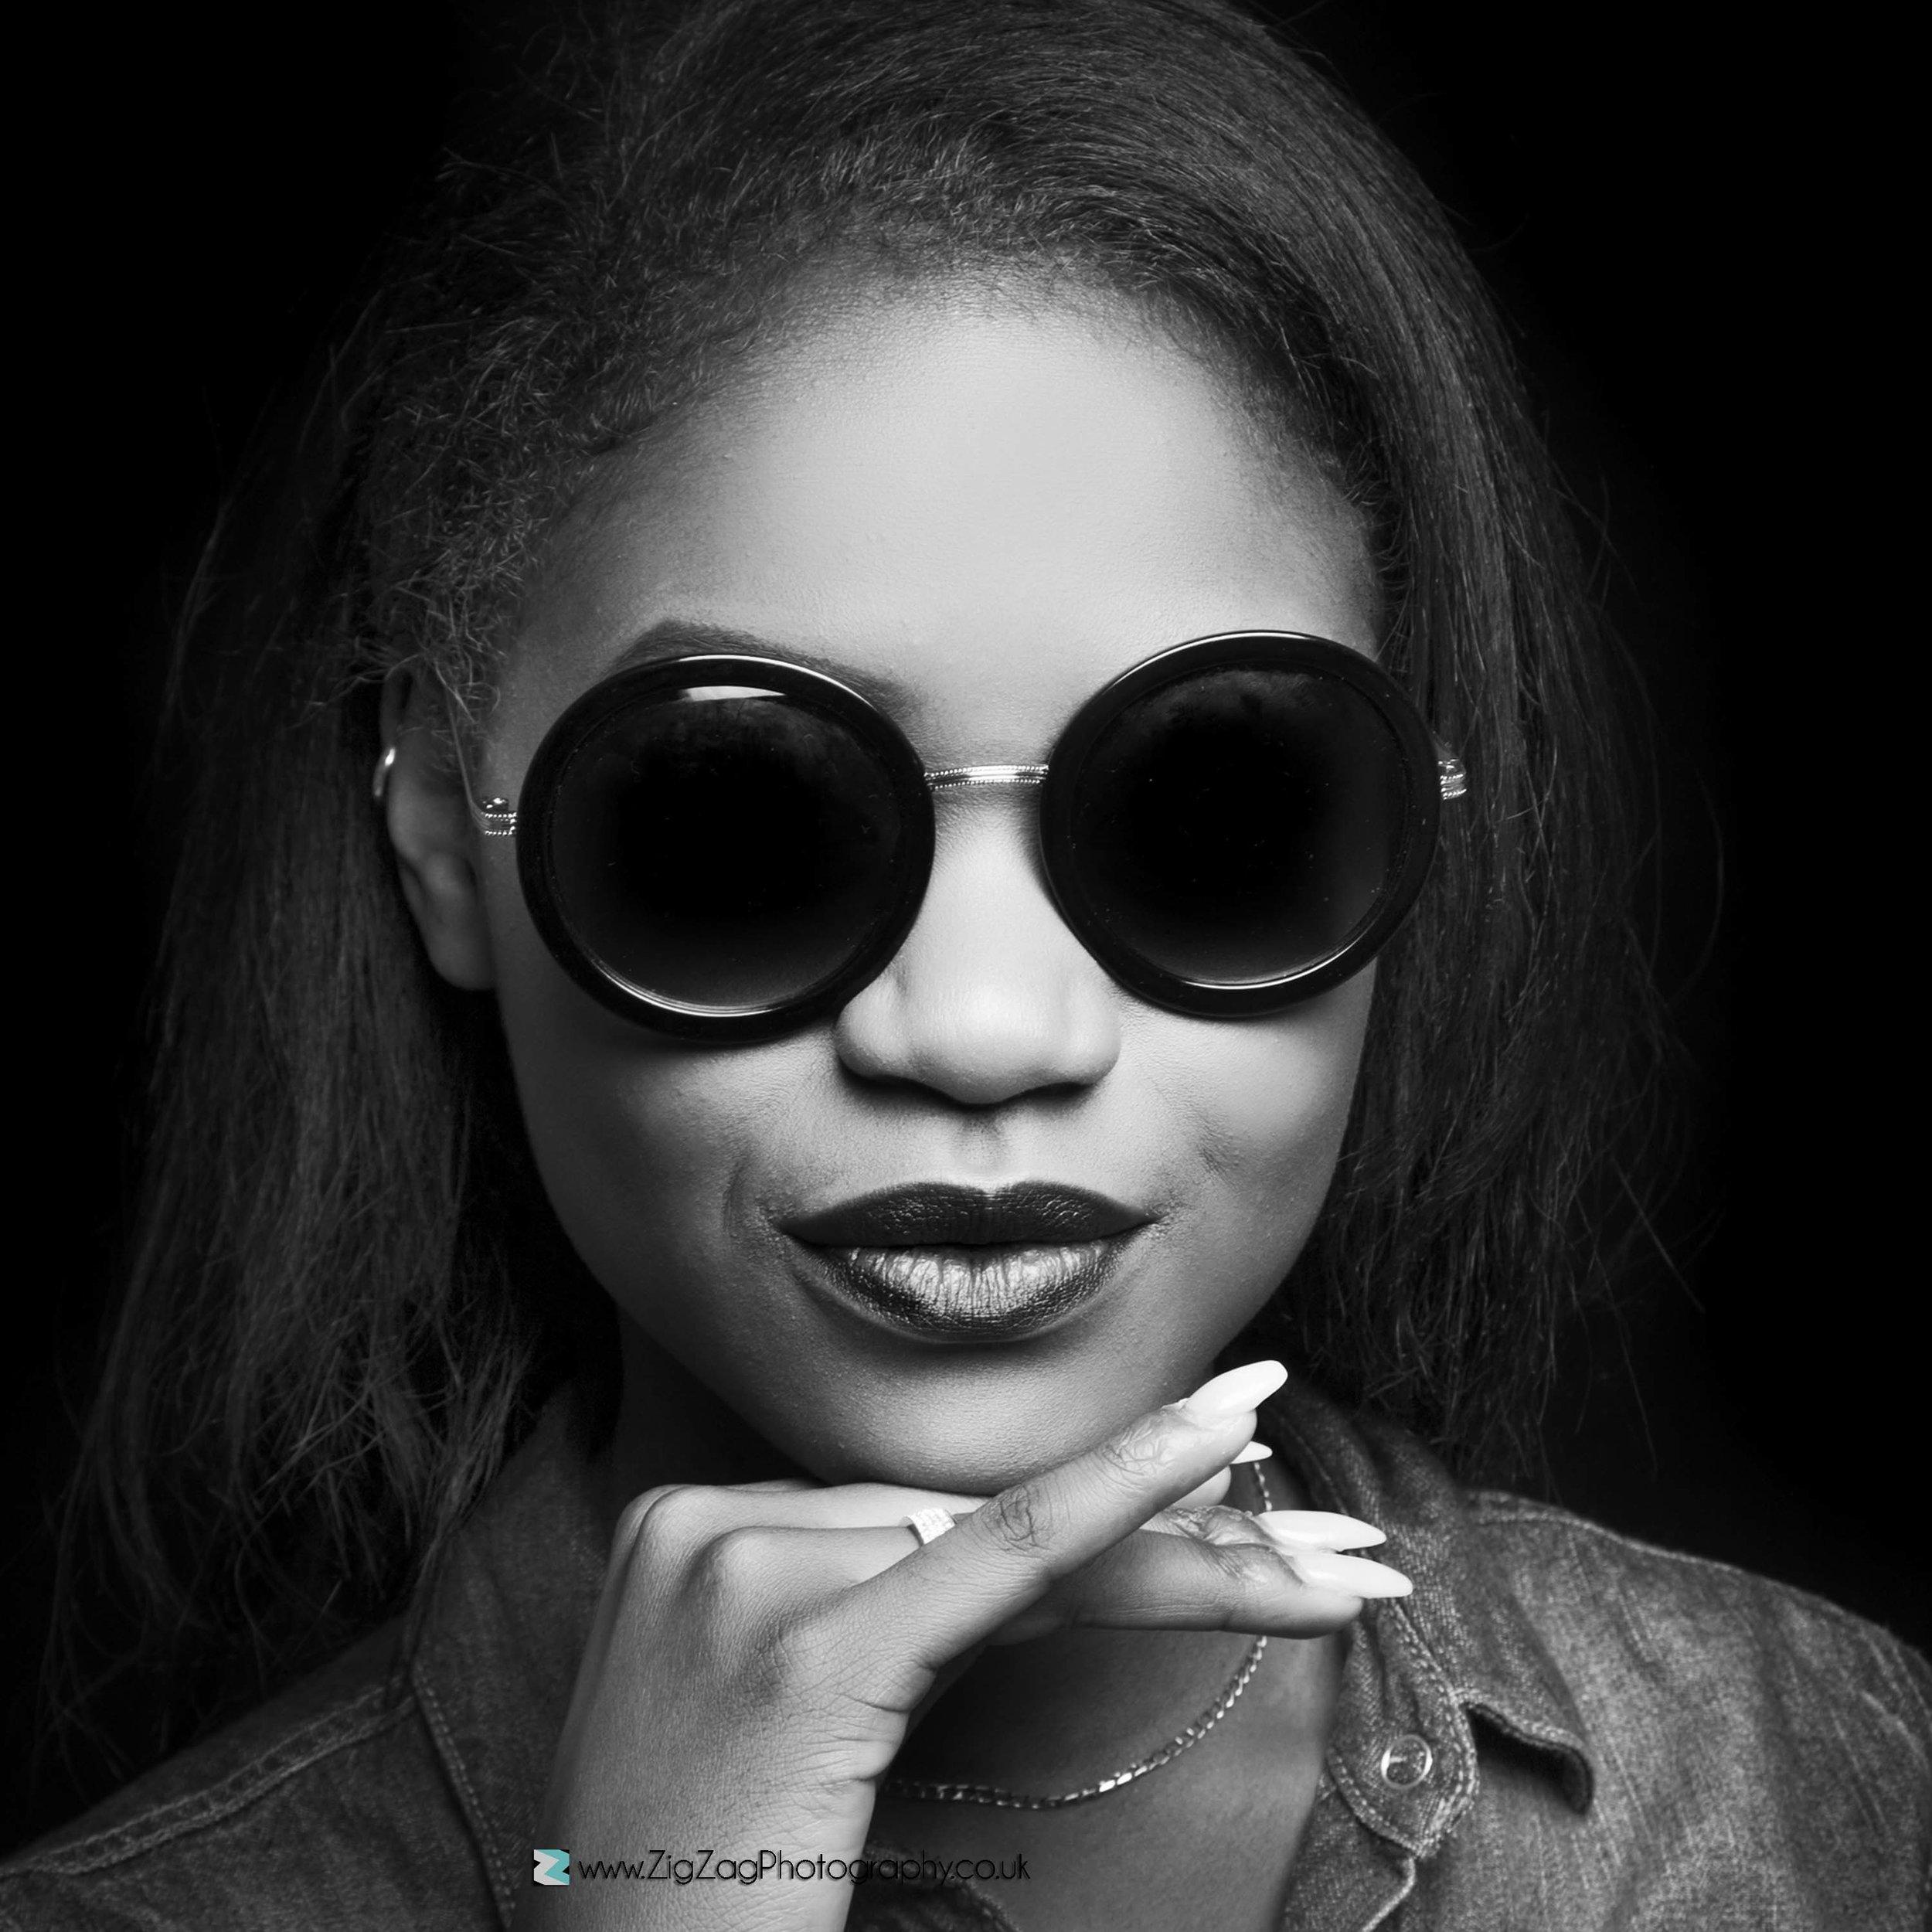 photography-session-leicester-studio-photoshoot-zigzag-woman-glasses-model-portfolio-profile-sunglasses-lips.jpg